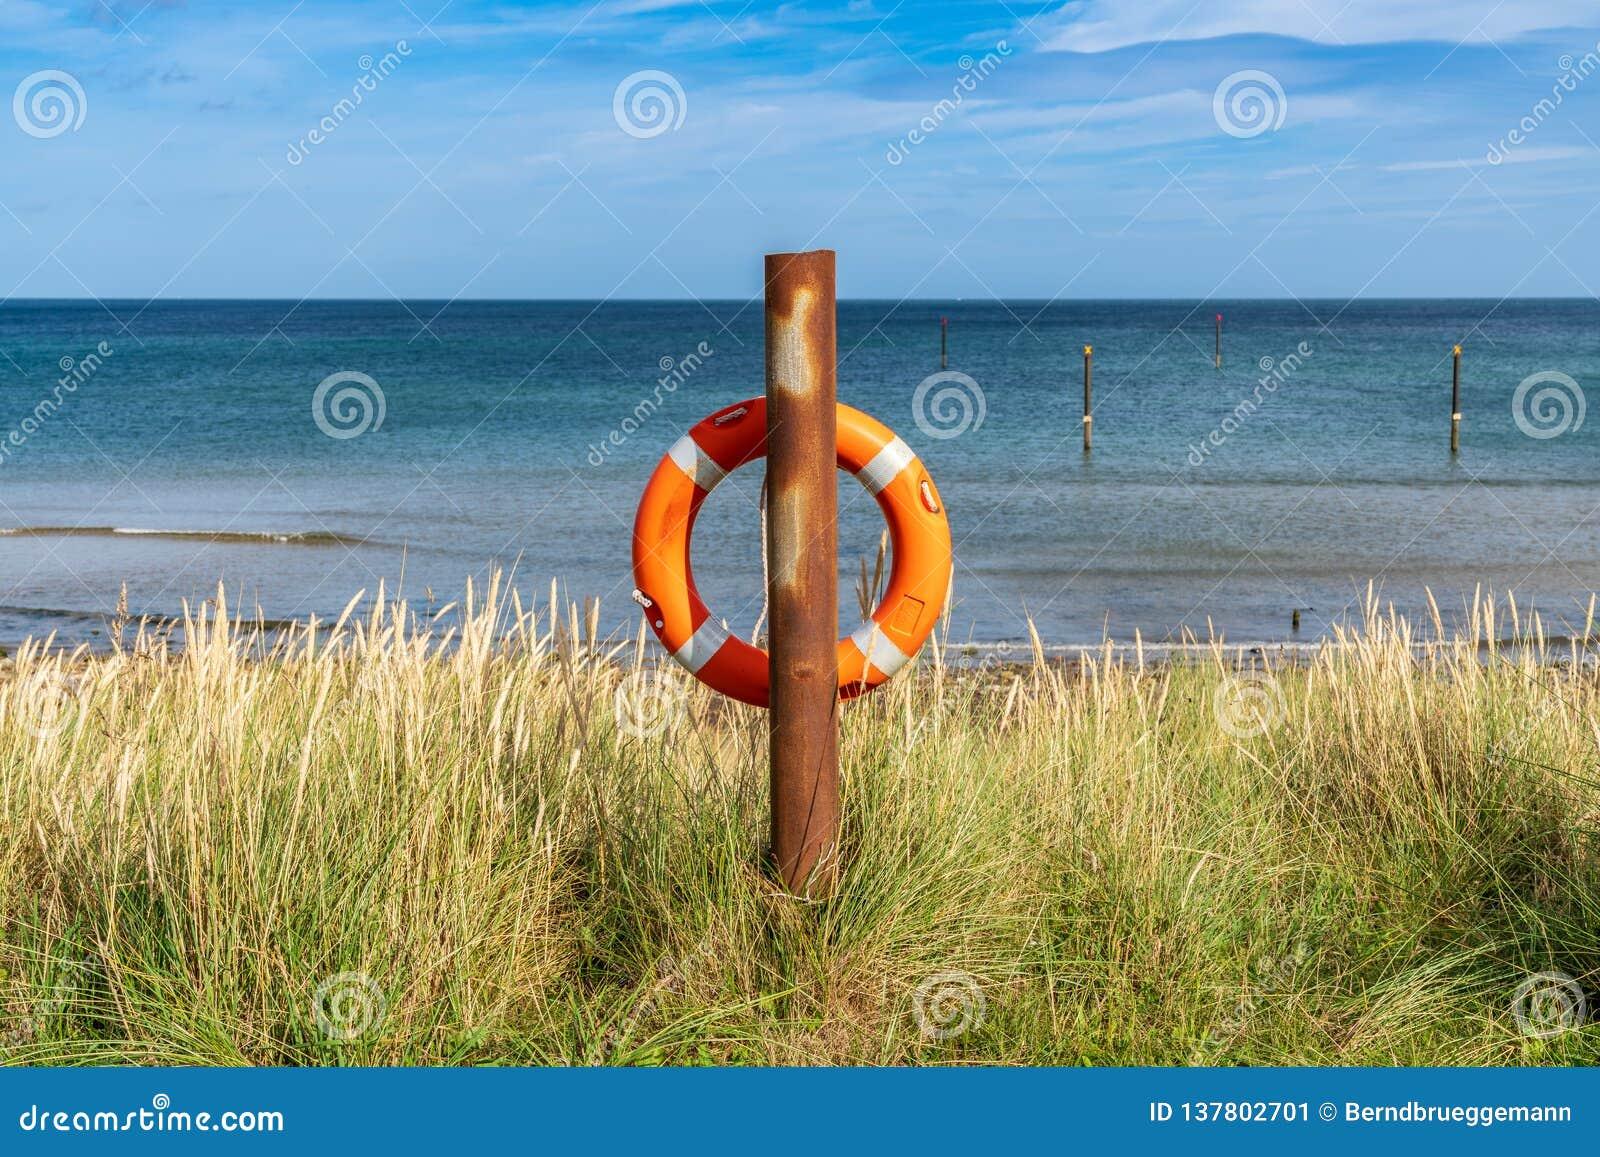 Lifebuoy at the North Sea Coast